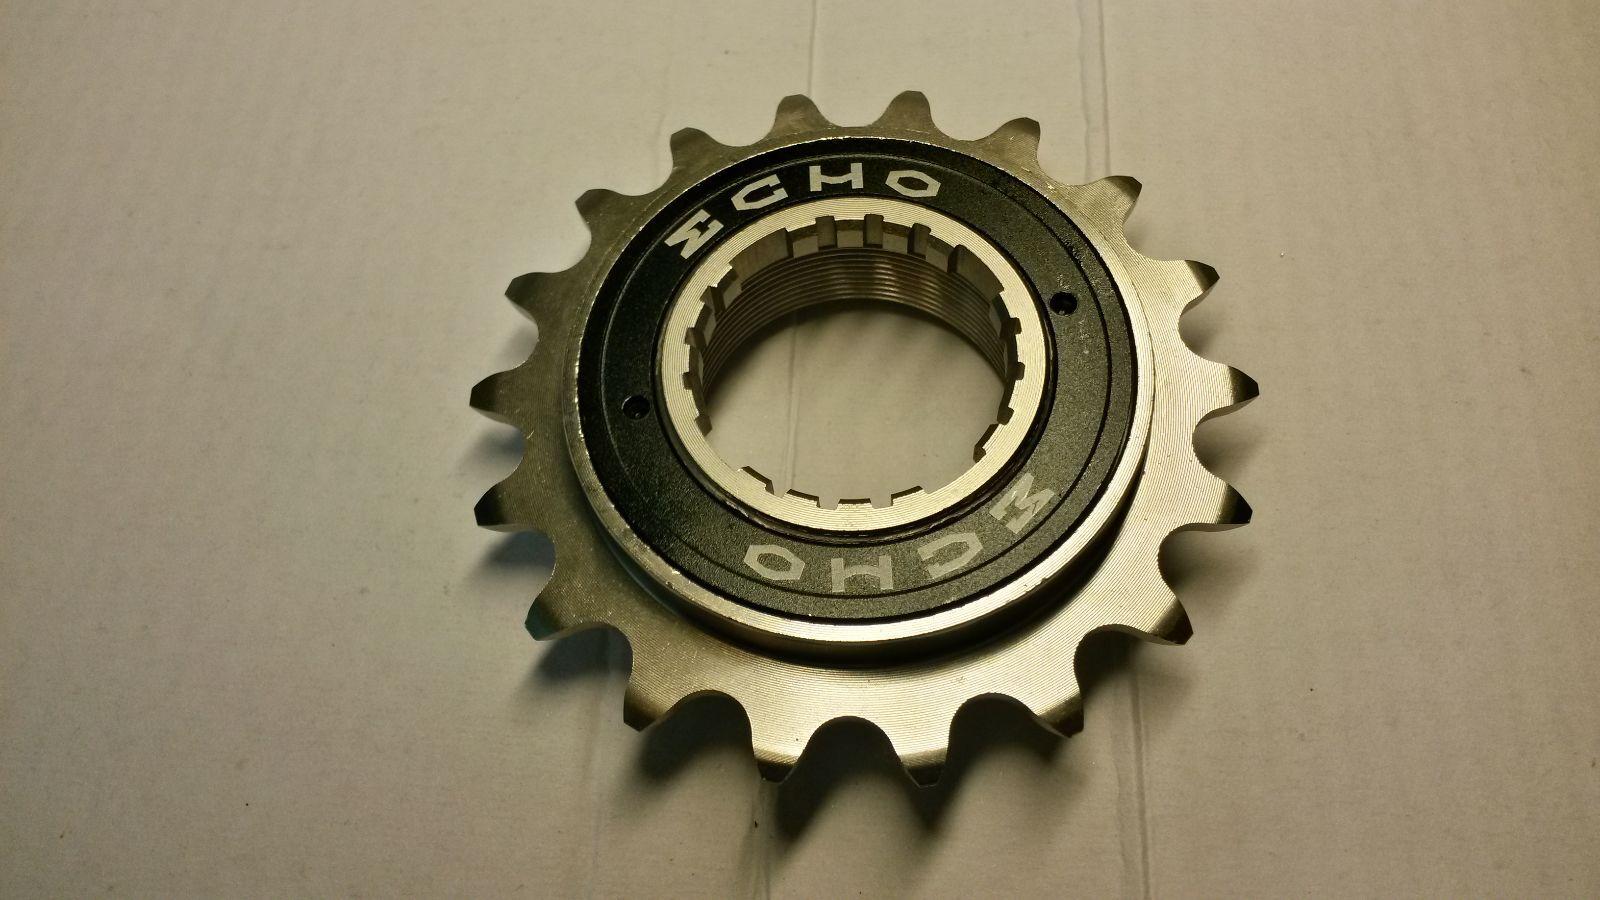 Freewheel  echo 18t trials bmx bike trial  high-quality merchandise and convenient, honest service